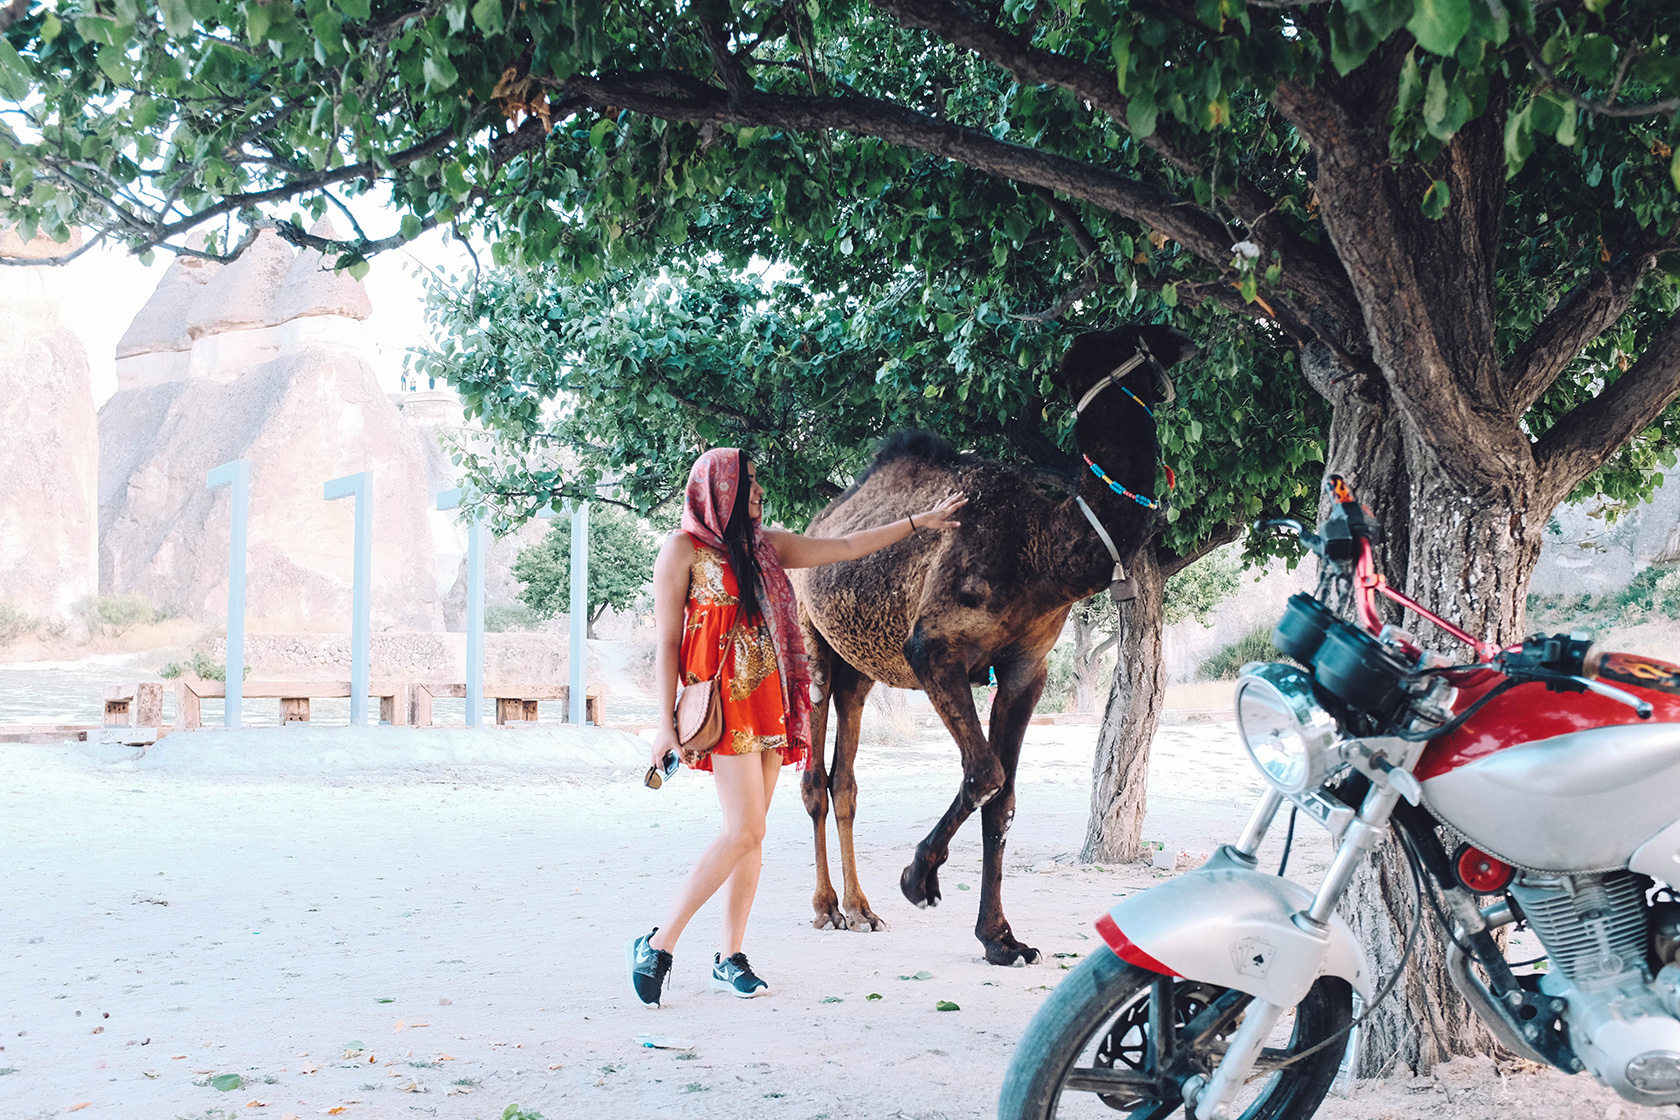 Sonia with a camel in Cappadocia